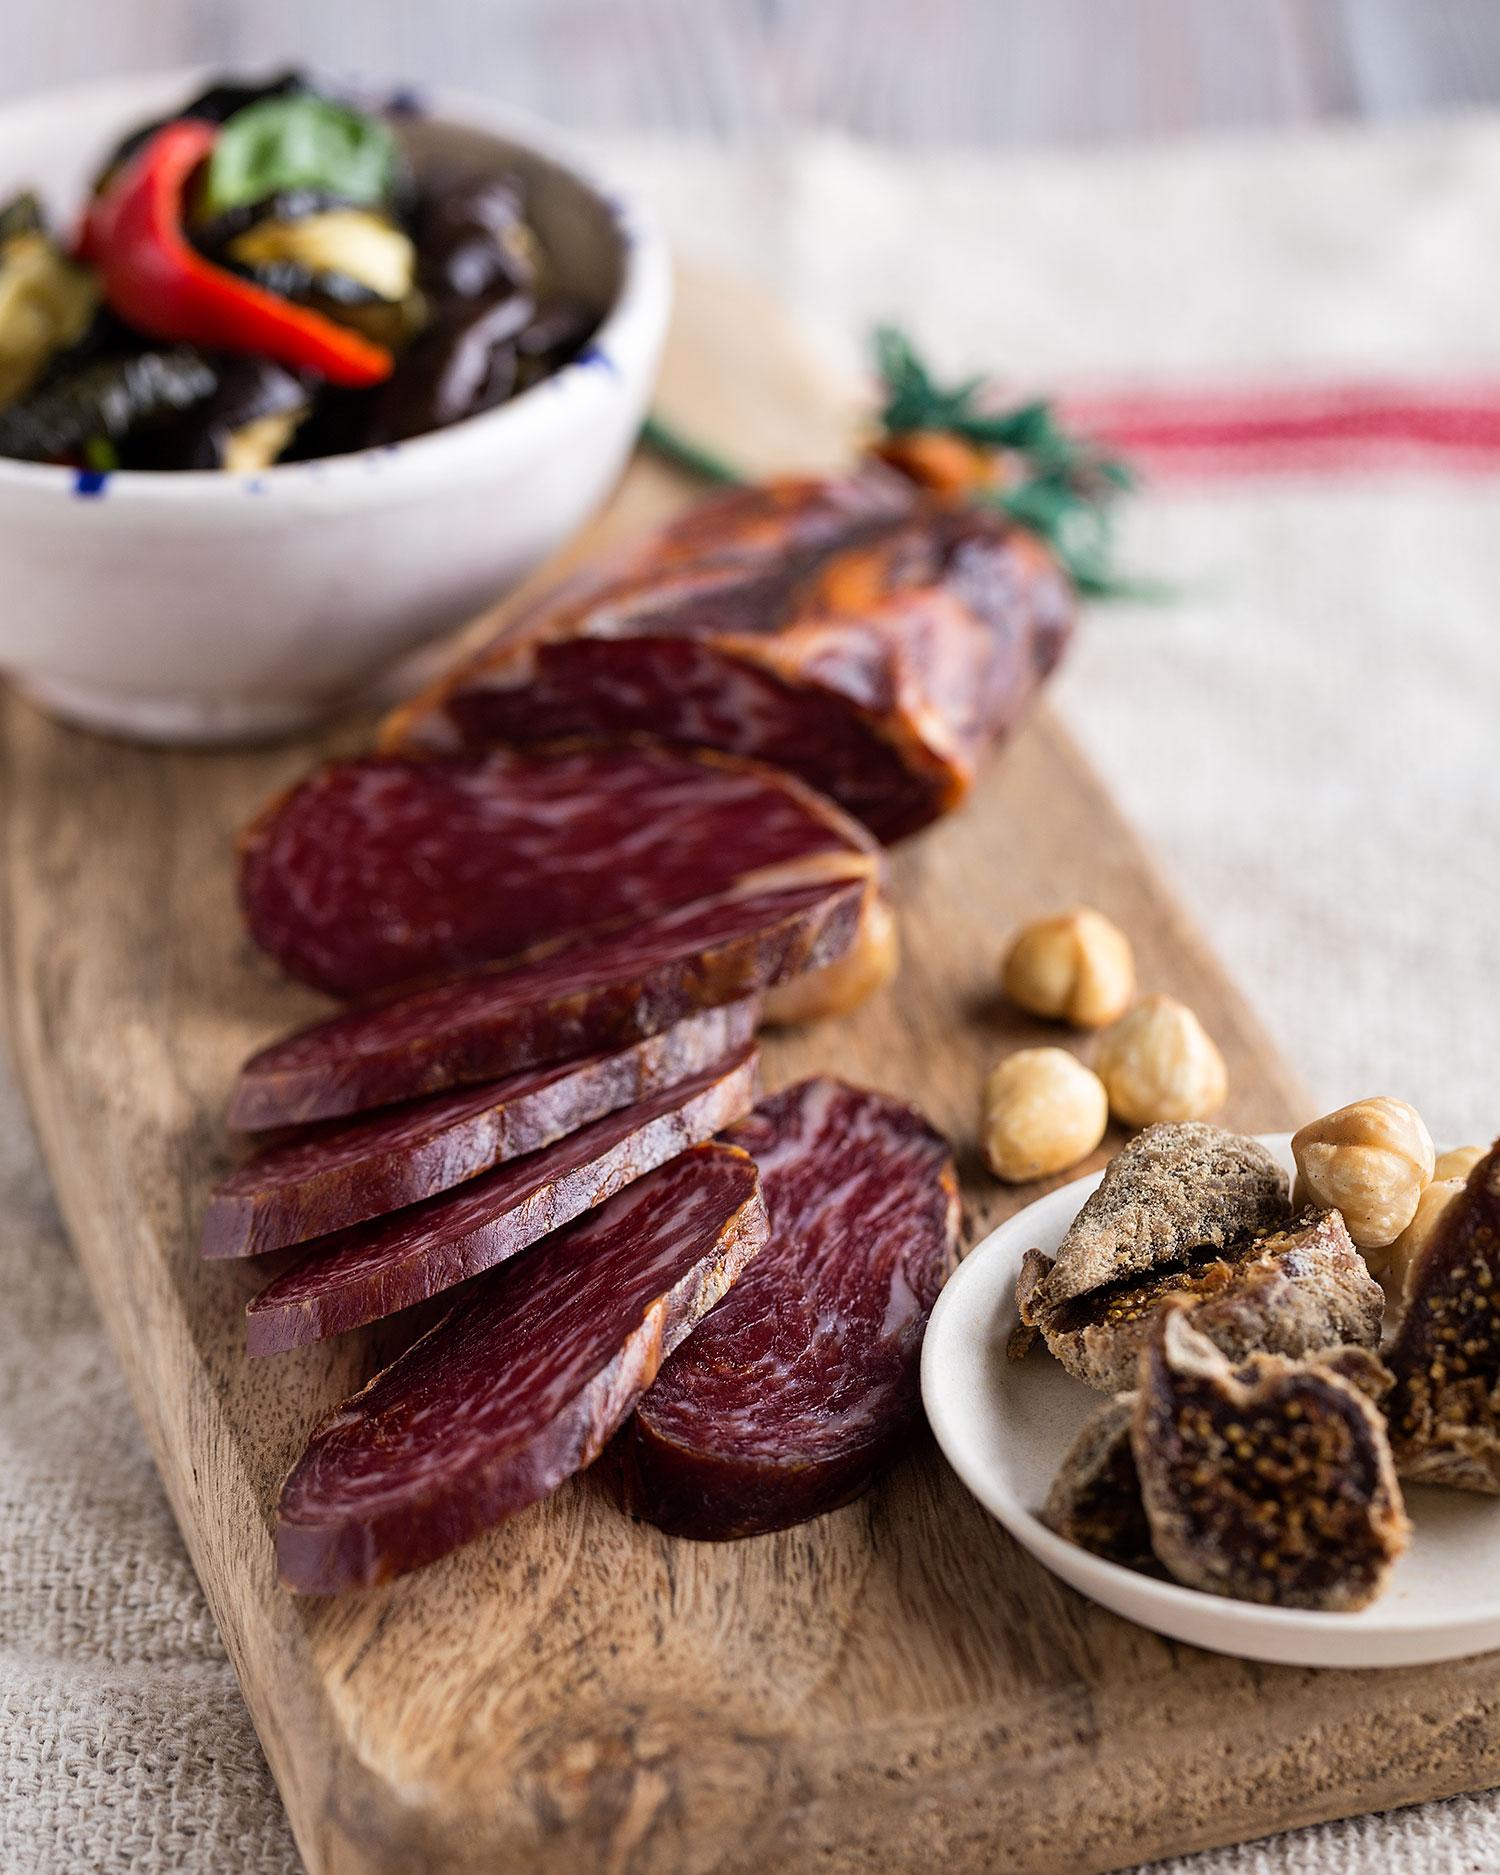 corina-landa-food-photography-fotografia-gastronomica-35.jpg